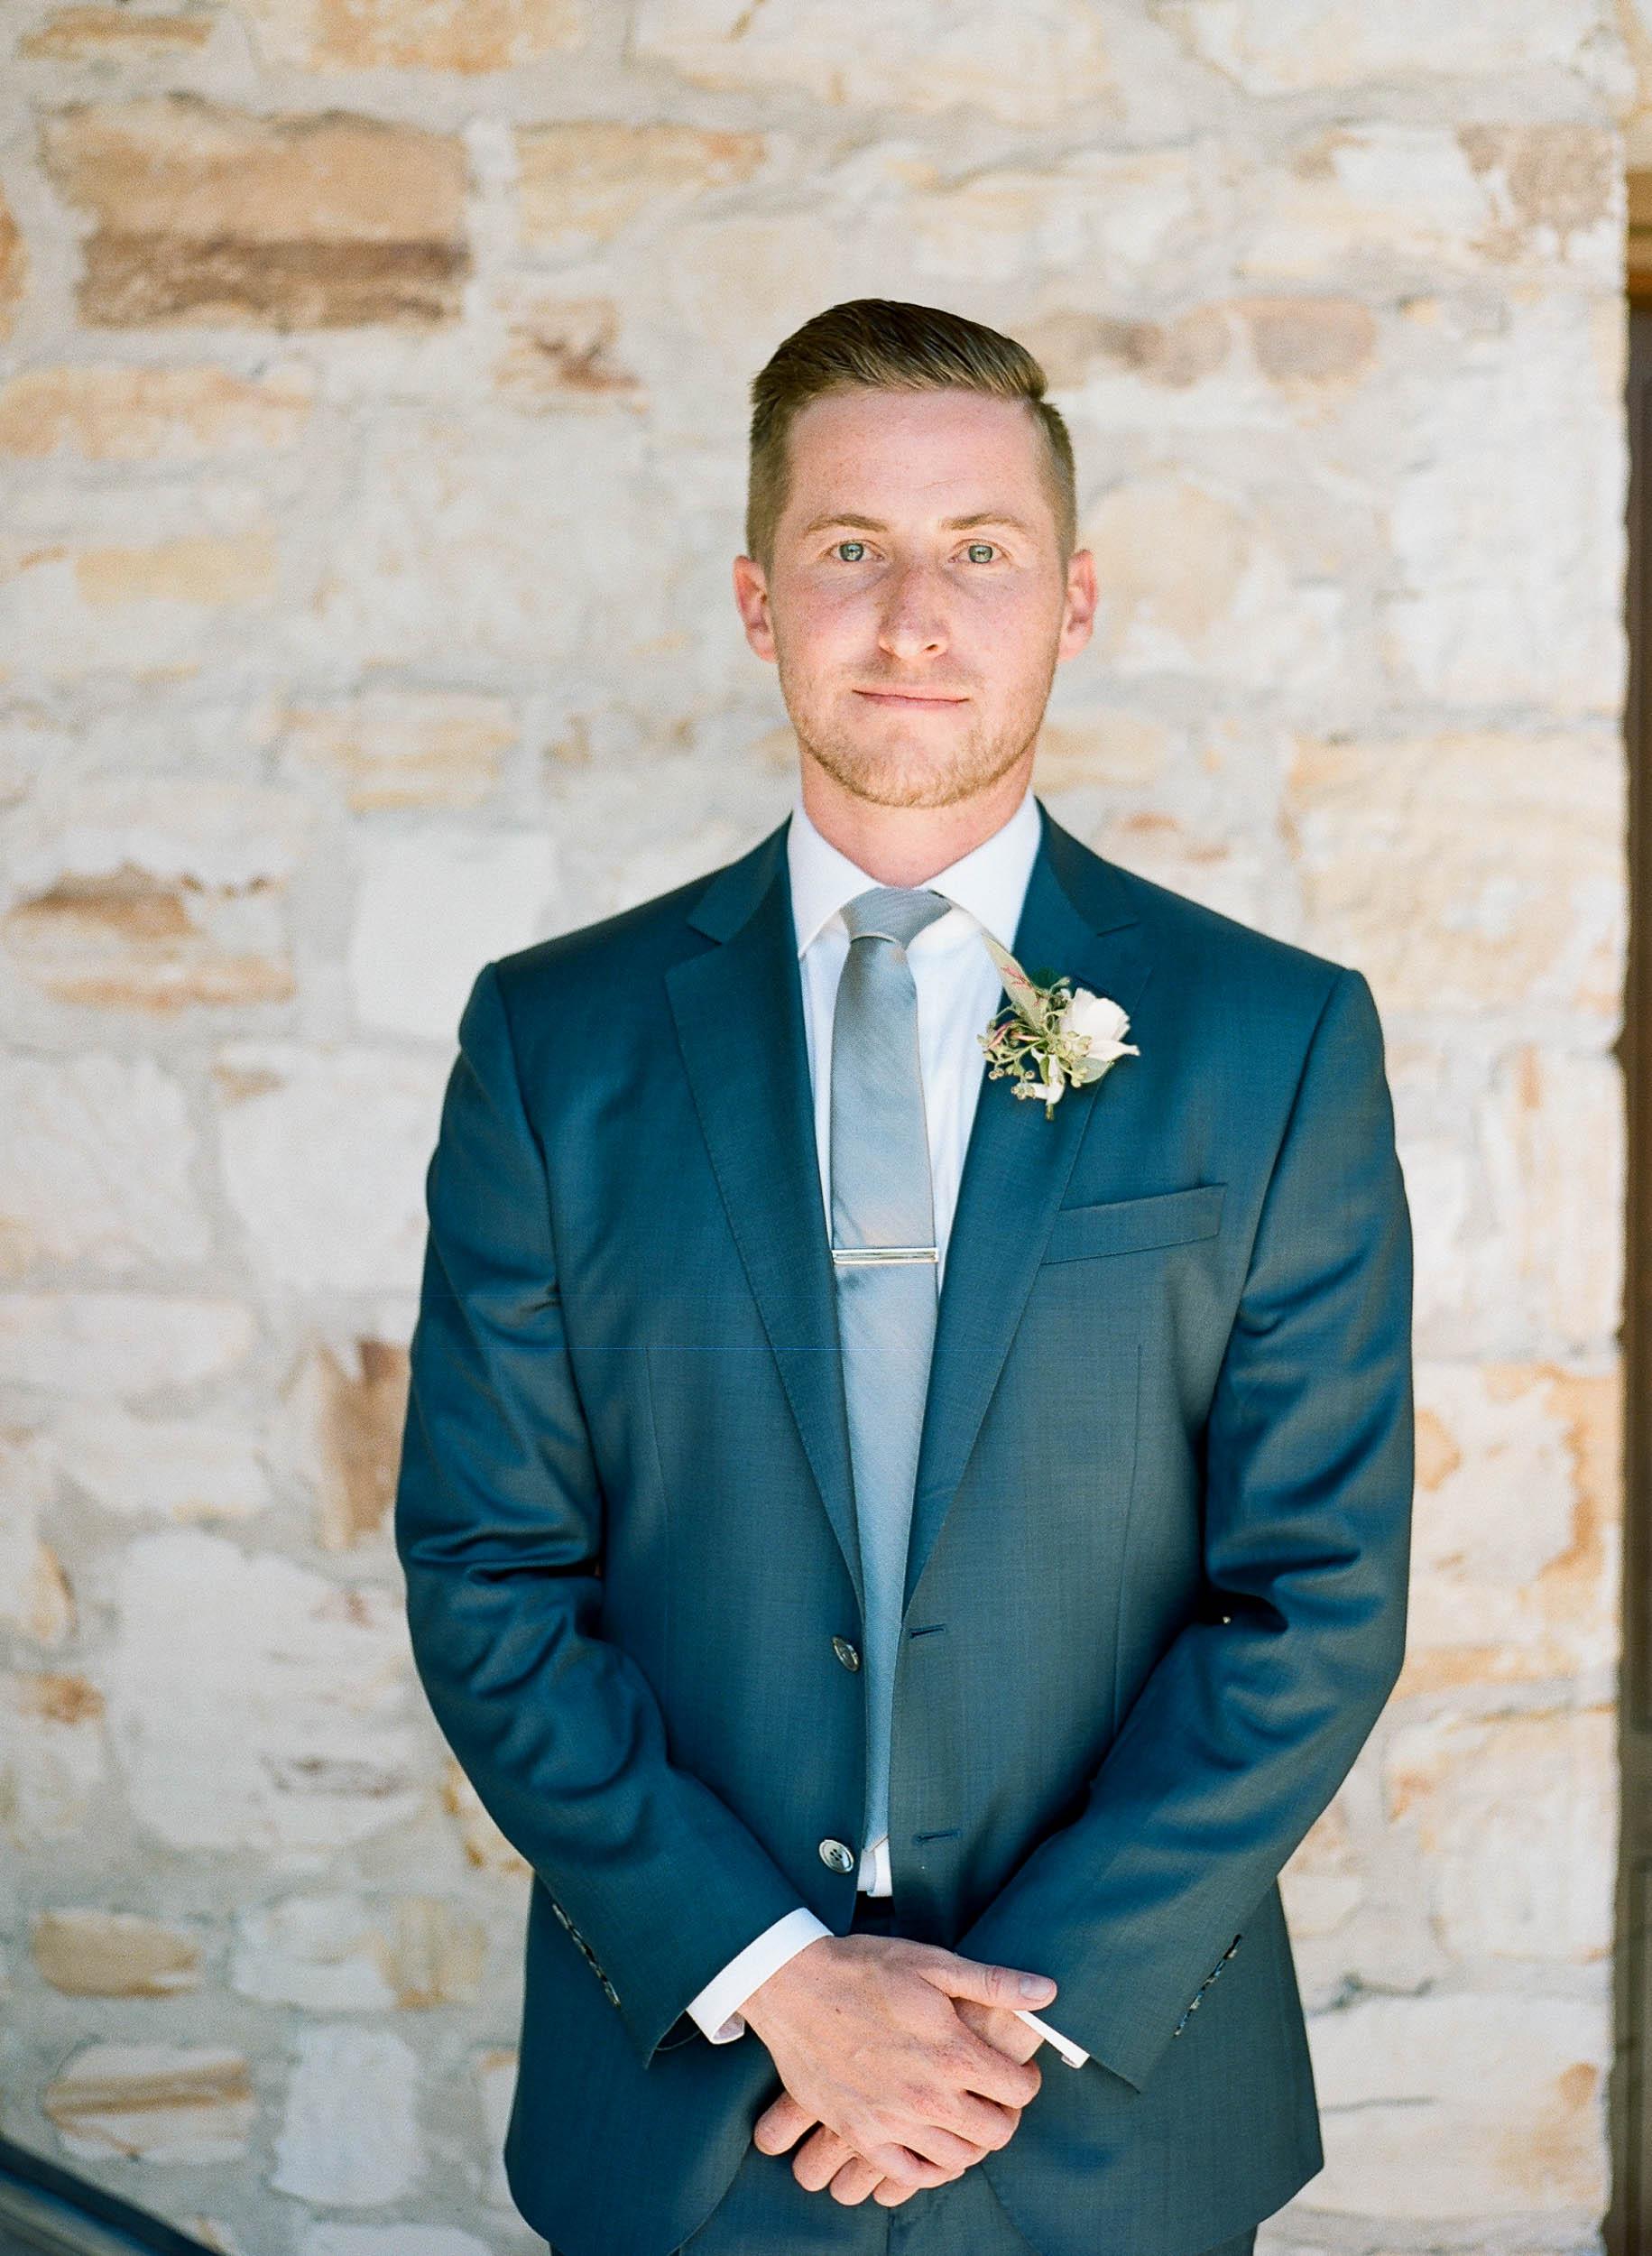 024_072118_D+K_Holman Ranch Wedding_Buena Lane Photography_00005428_98 copy.jpg